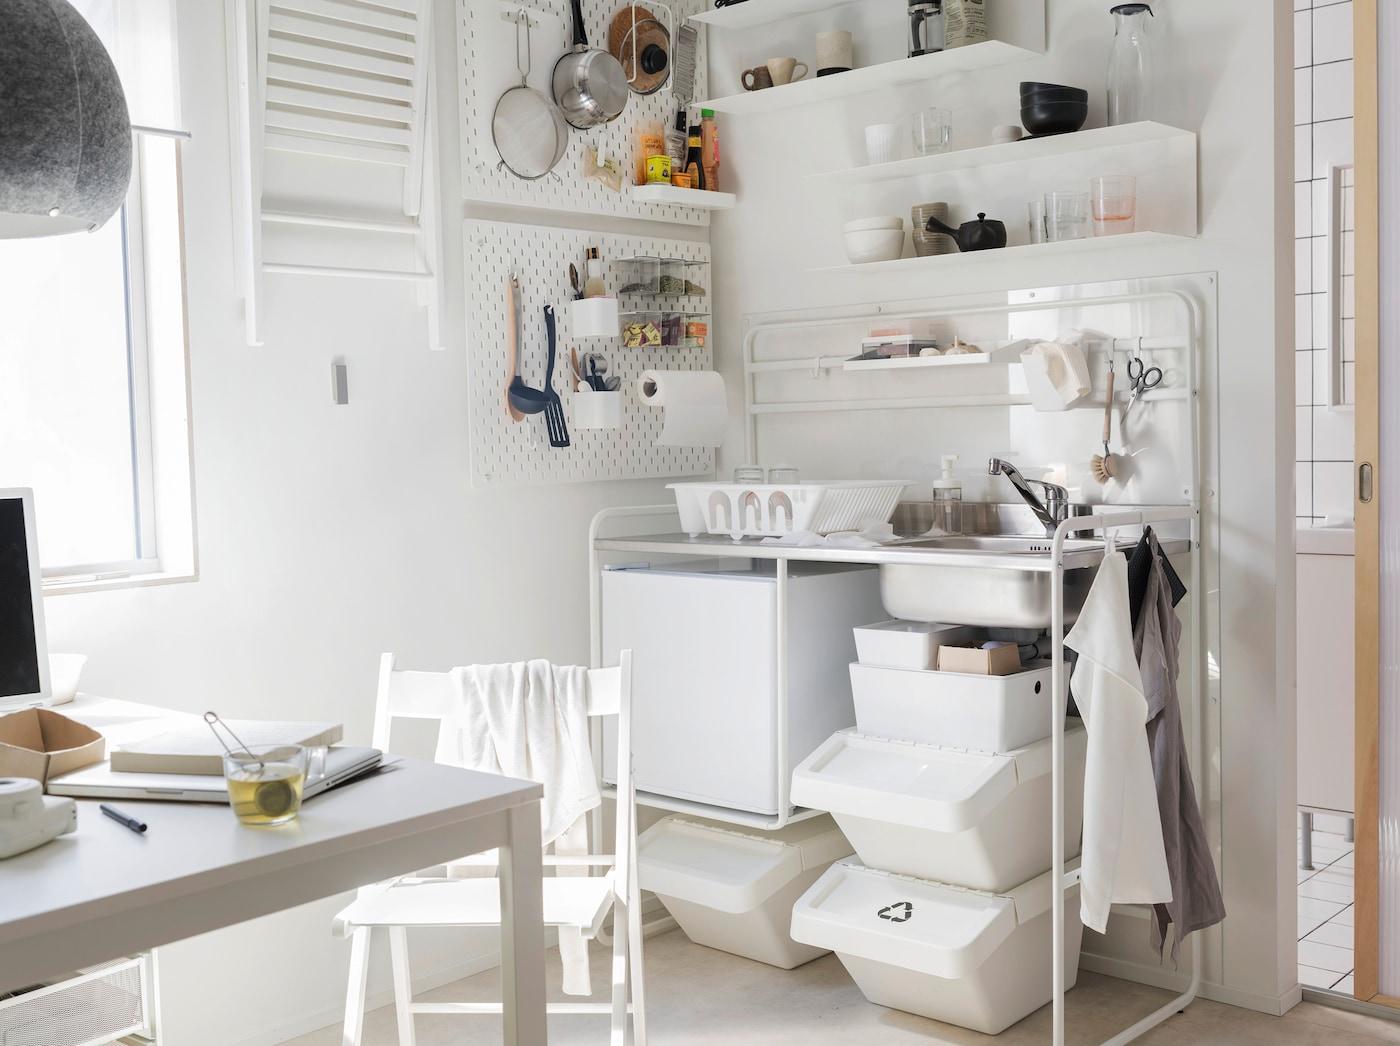 Tiny Kitchenette for Smart Kitchen  IKEA Egypt - IKEA